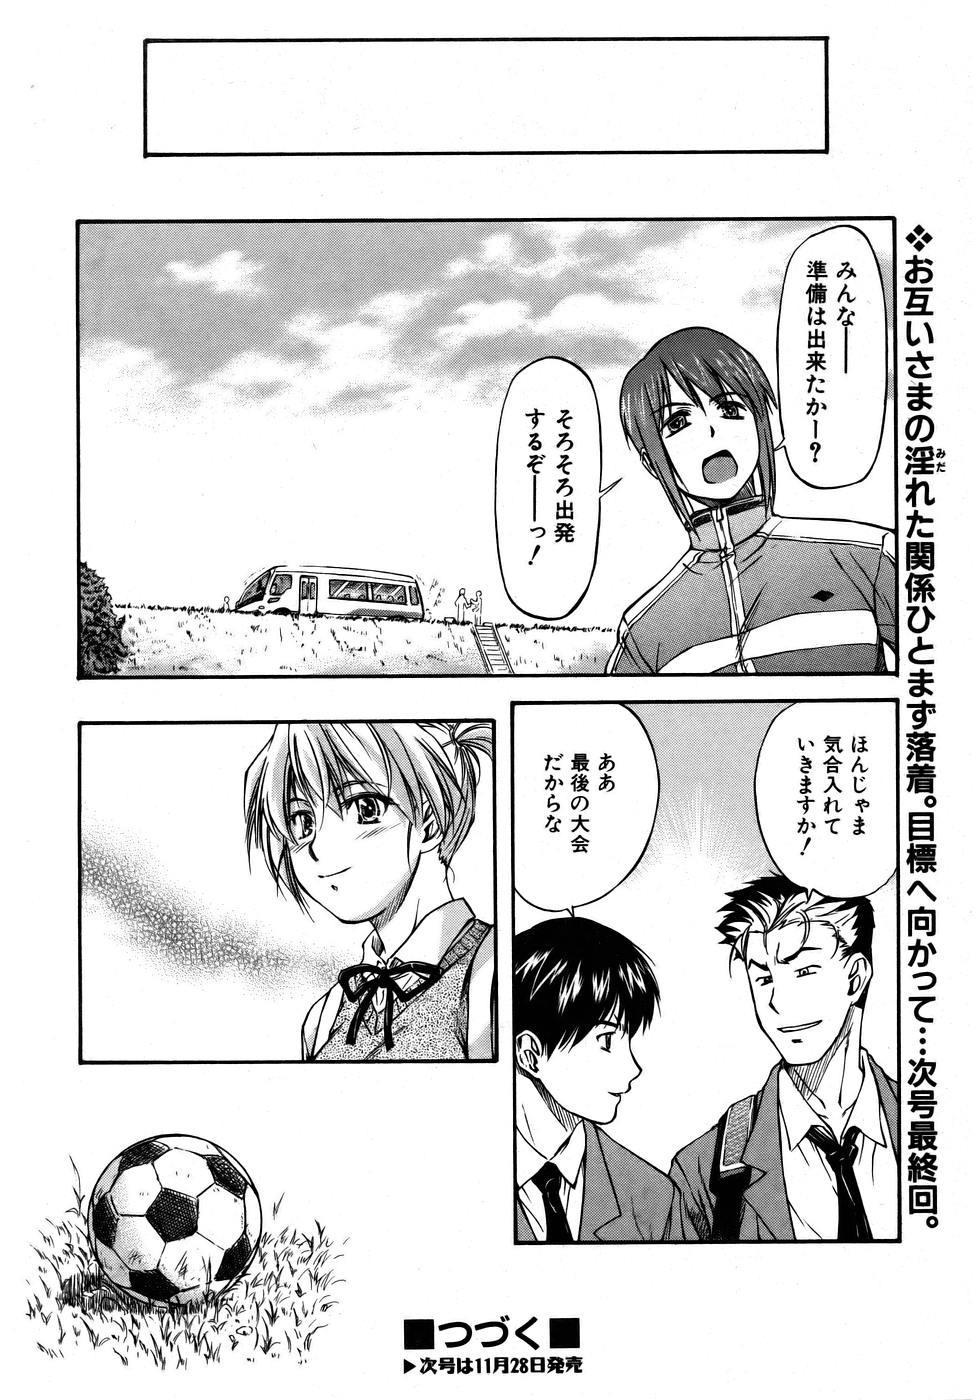 COMIC AUN 2005-12 Vol. 115 57